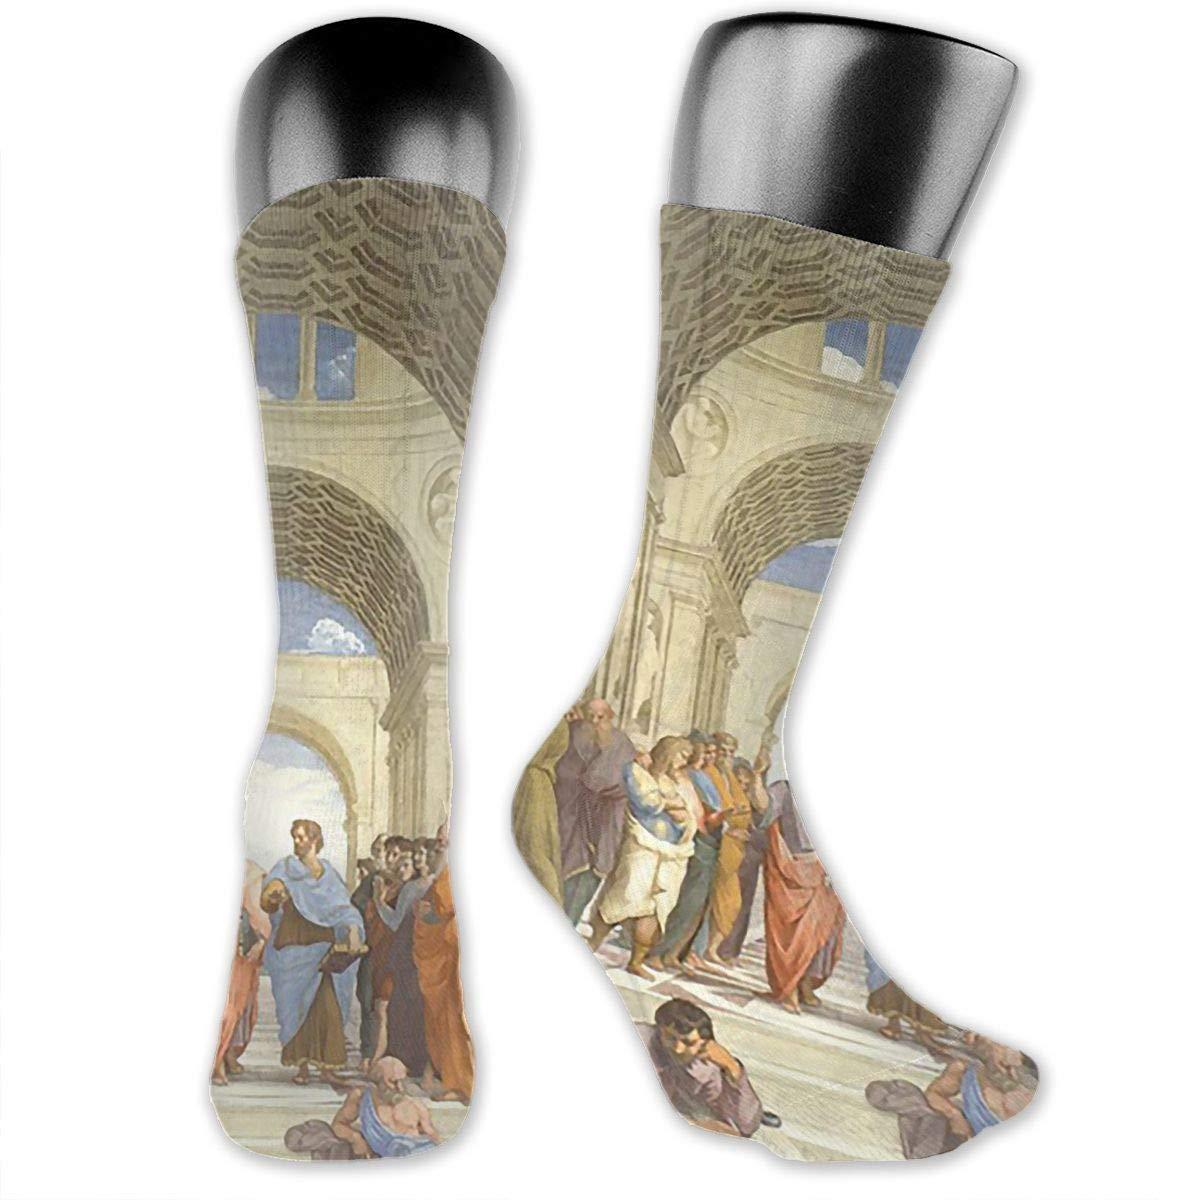 Renaissance Art Church Mens Dress Socks Novelty Crew Socks 15.7